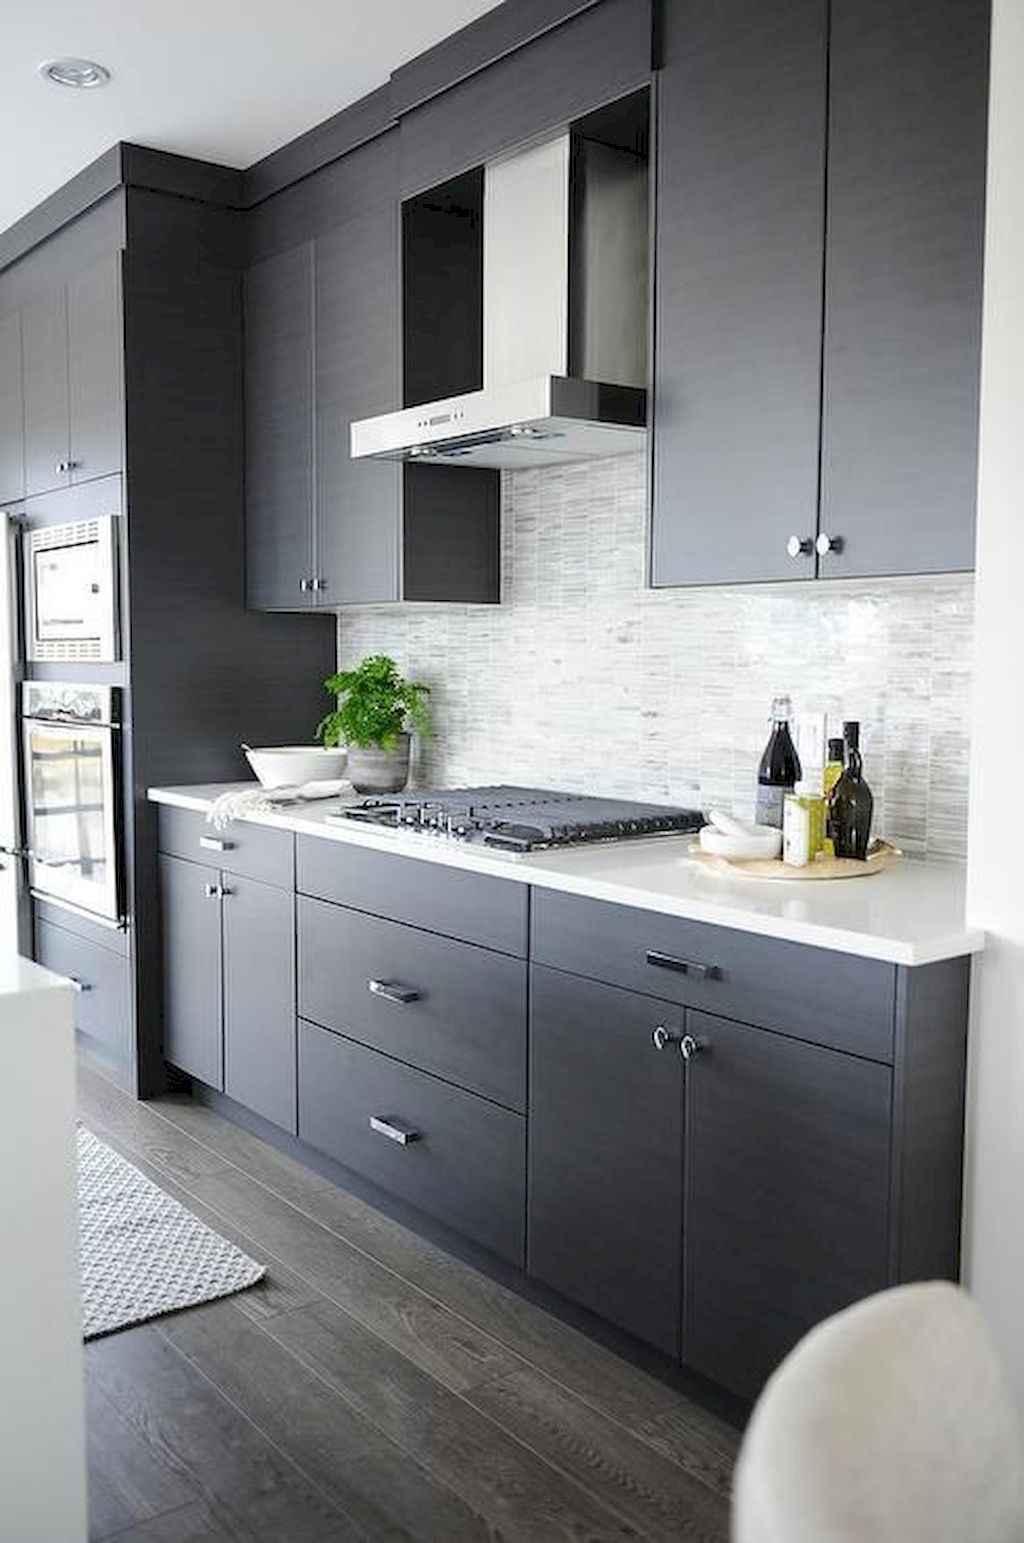 Gorgeous gray kitchen cabinet makeover ideas (18)